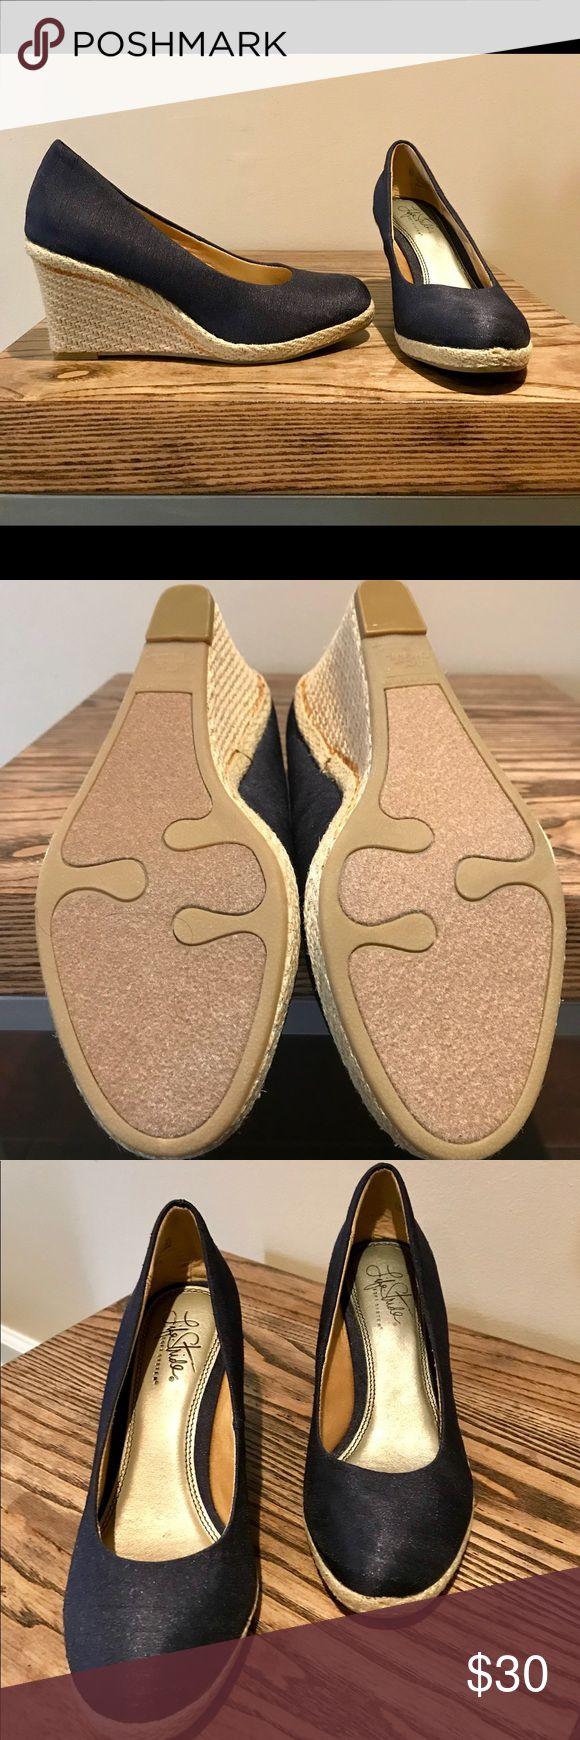 LifeStride Soft System Navy Wedge sz 6.5 LifeStride soft system Navy Wedge sz 6.5m  NWOT Life Stride Shoes Wedges